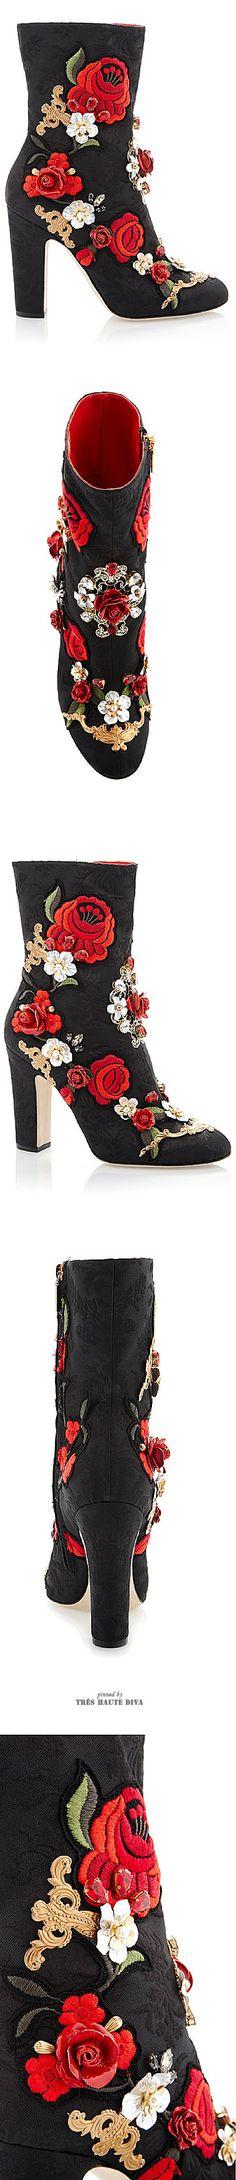 Dolce & Gabbana Bullfight Jacquard Embellished Boot SS 2015 ♔ Tres Haute Diva